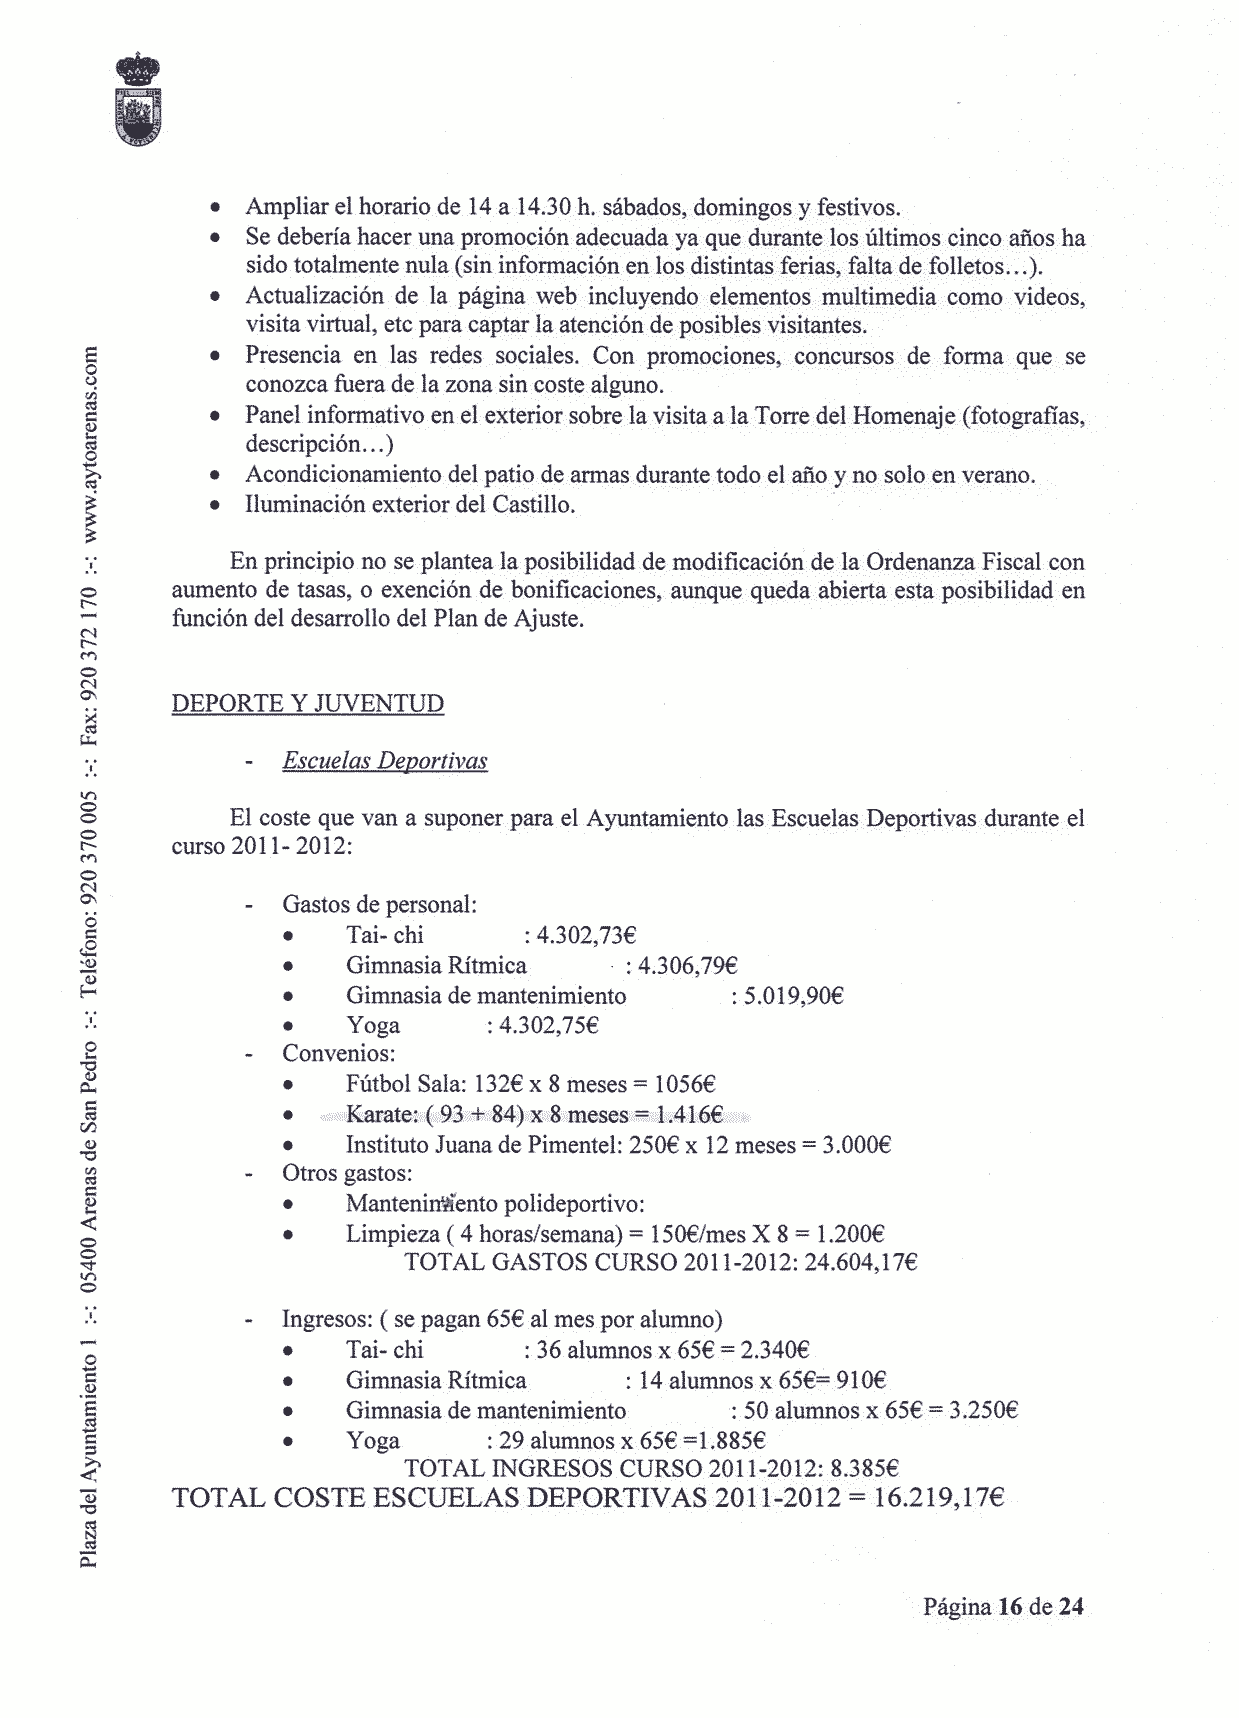 PlanViabilidadAytoArenas-16